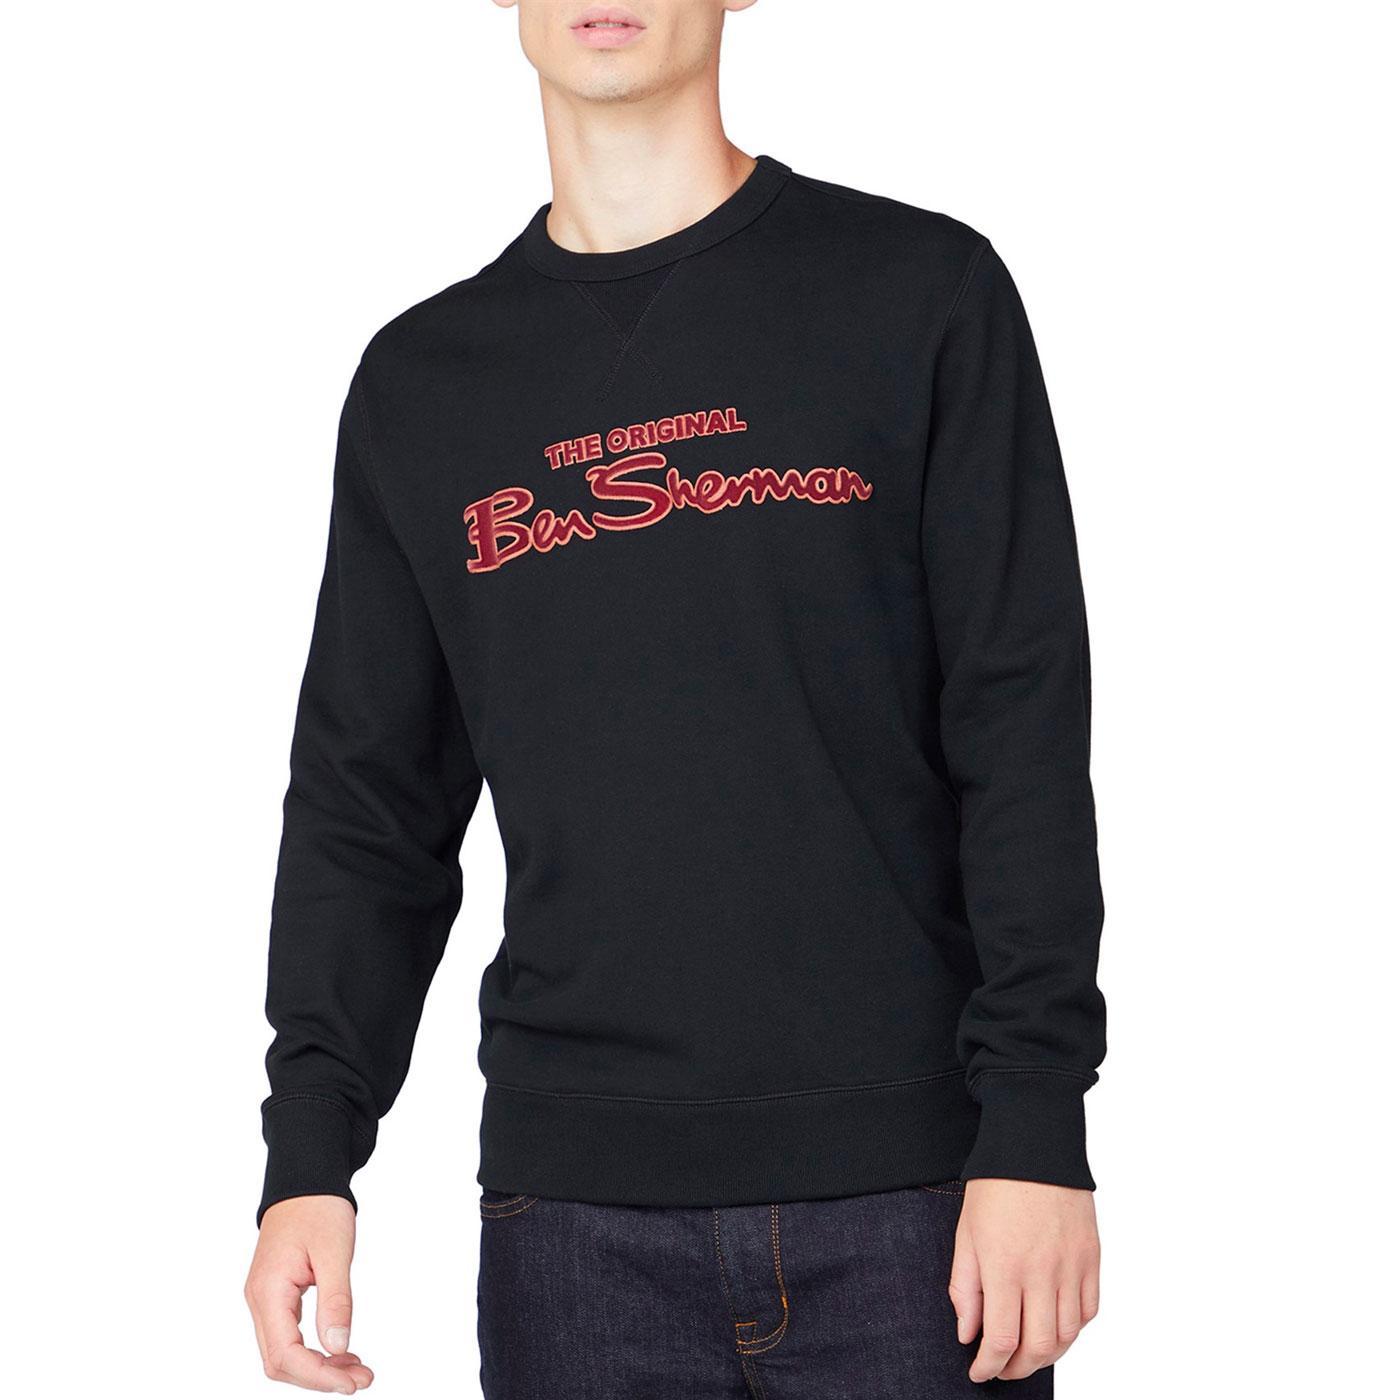 BEN SHERMAN Retro 90s Flock Print Logo Sweatshirt